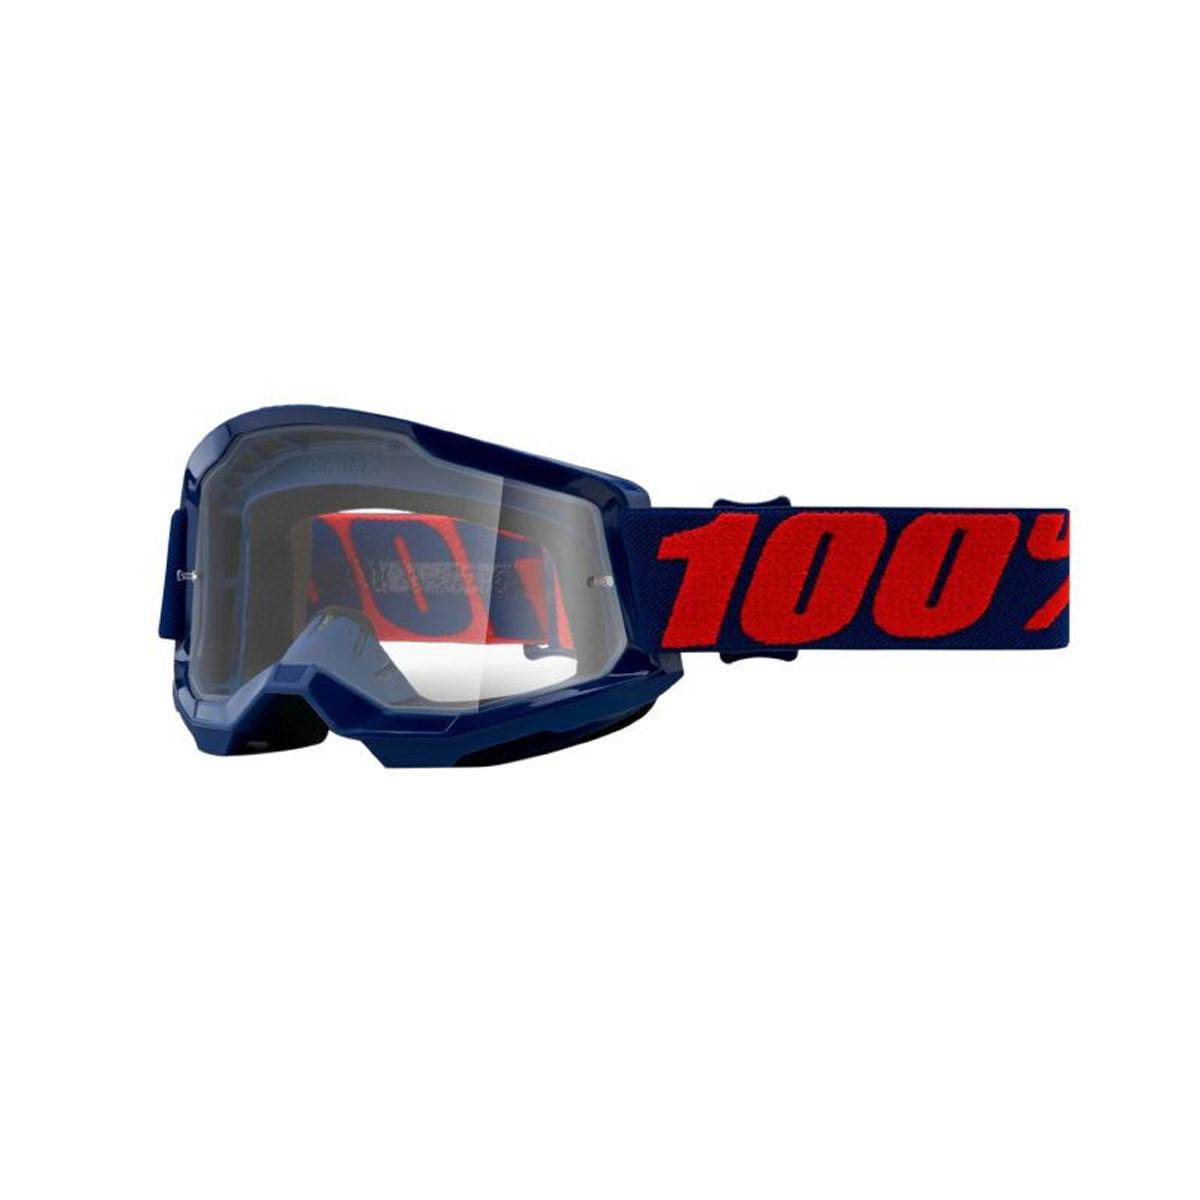 Masque / Lunettes Cross - 100% Strata 2 Masego Bleu Ecran Transparent